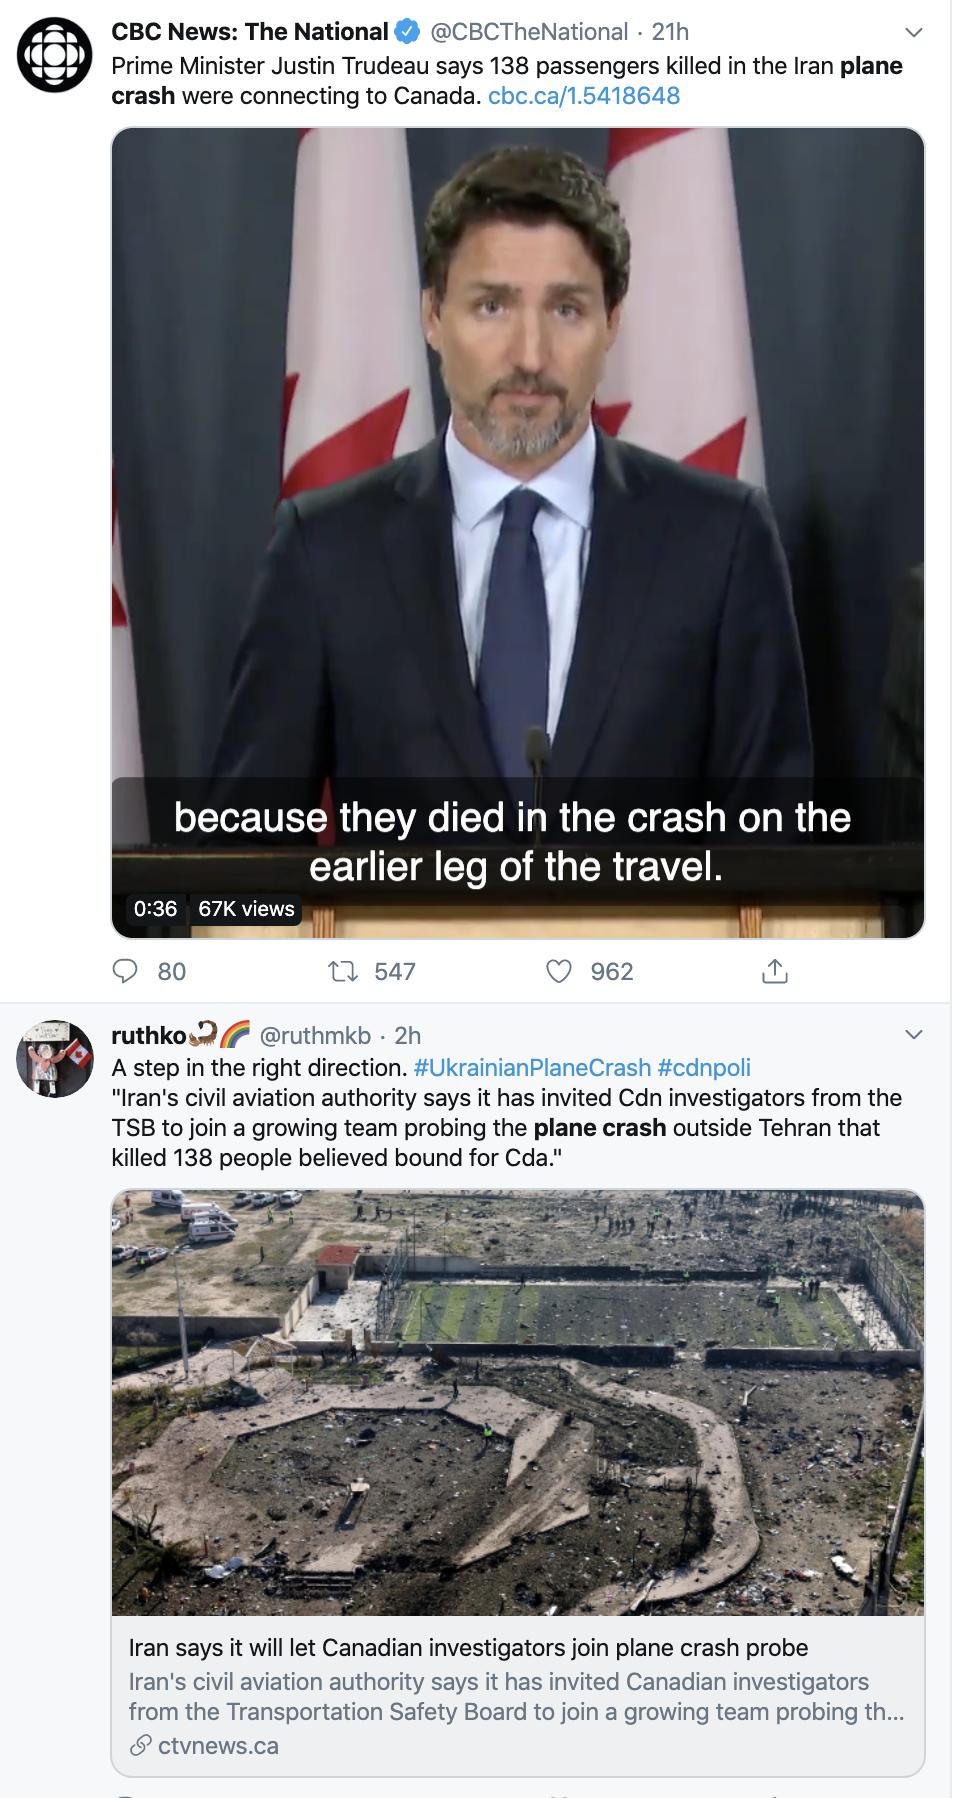 Screen-Shot-2020-01-09-at-1.34.02-PM Trump Makes Shady Ukraine Passenger Plane Remarks Donald Trump Featured Military Top Stories War